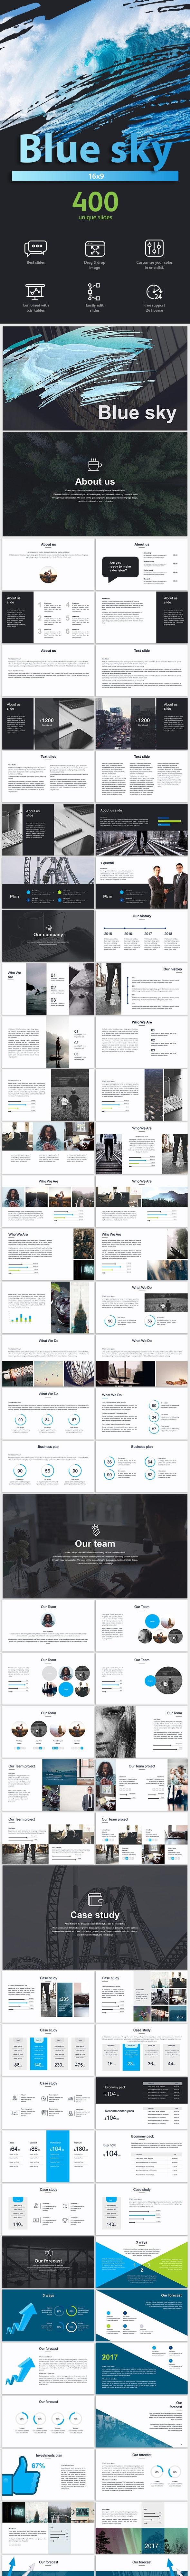 Blue sky Keynote template - Business Keynote Templates